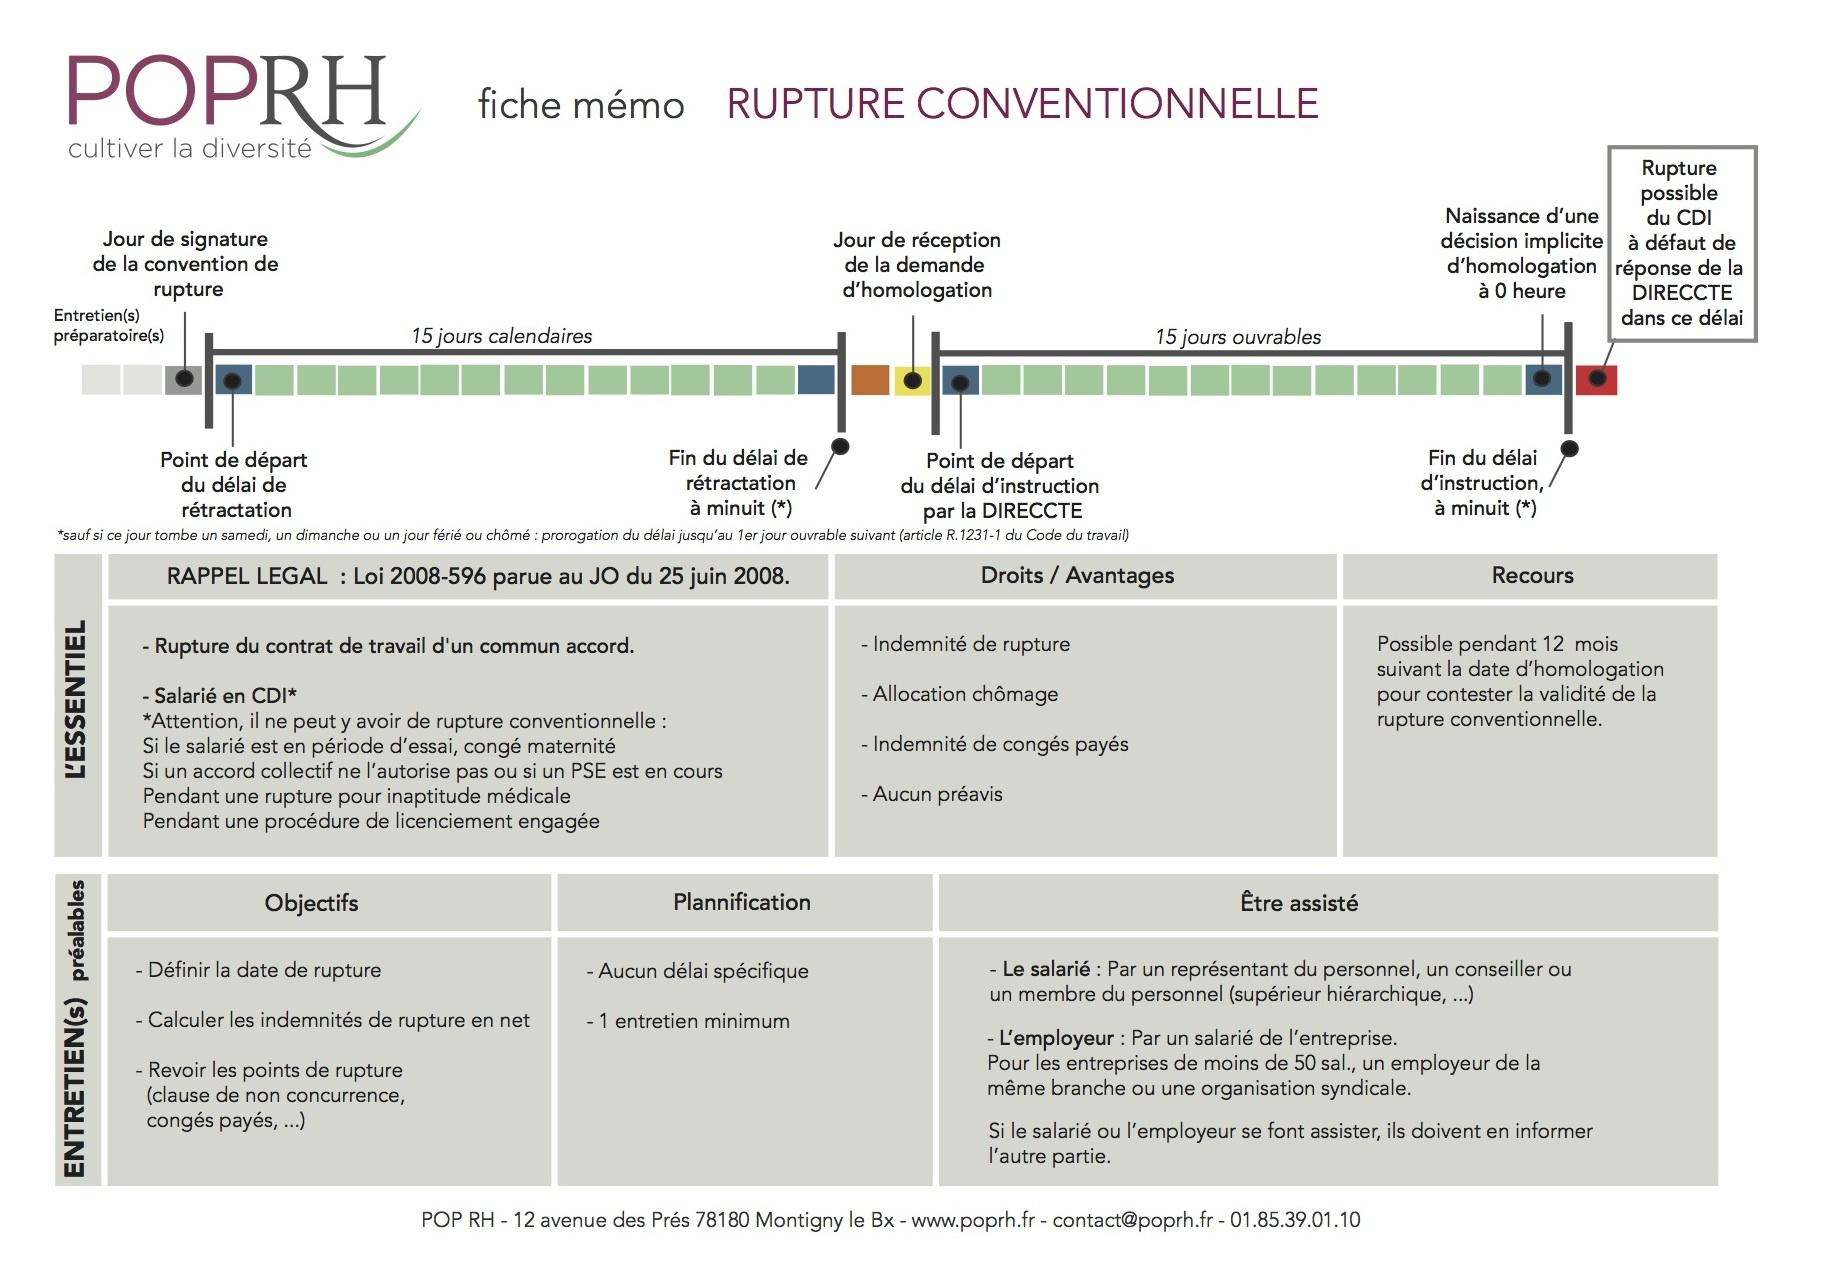 Rupture Conventionnelle Archives Pop Rh Externalisation Rh